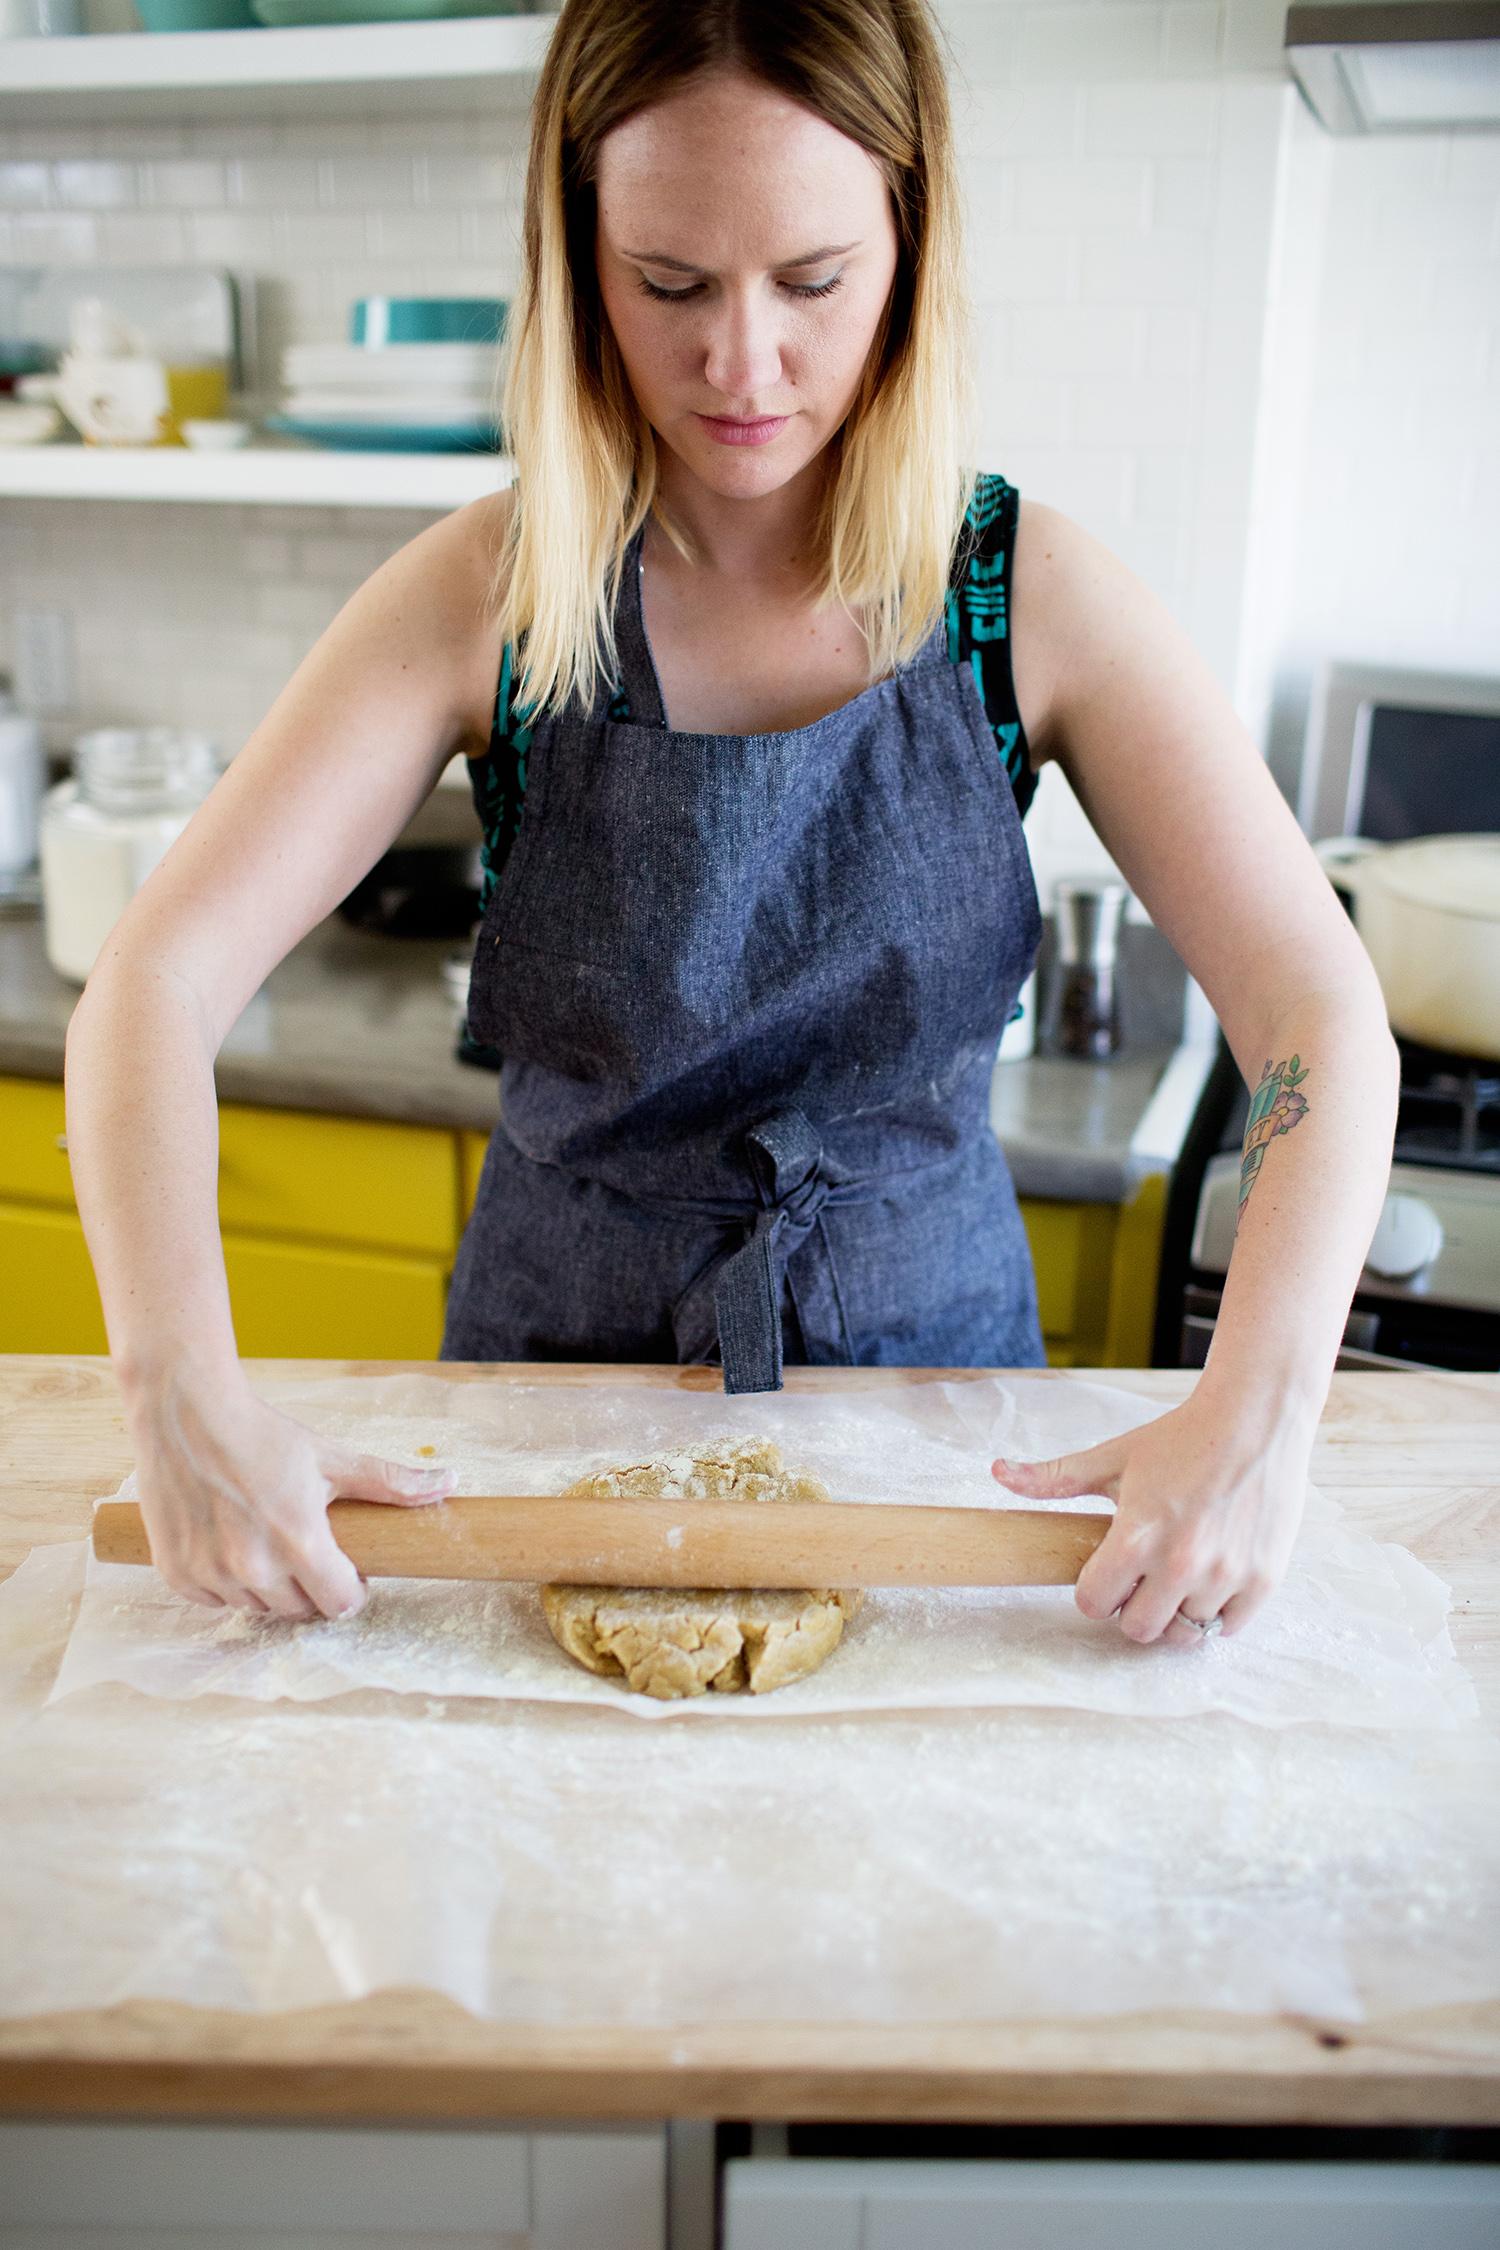 Emma baking honeycomb cookies